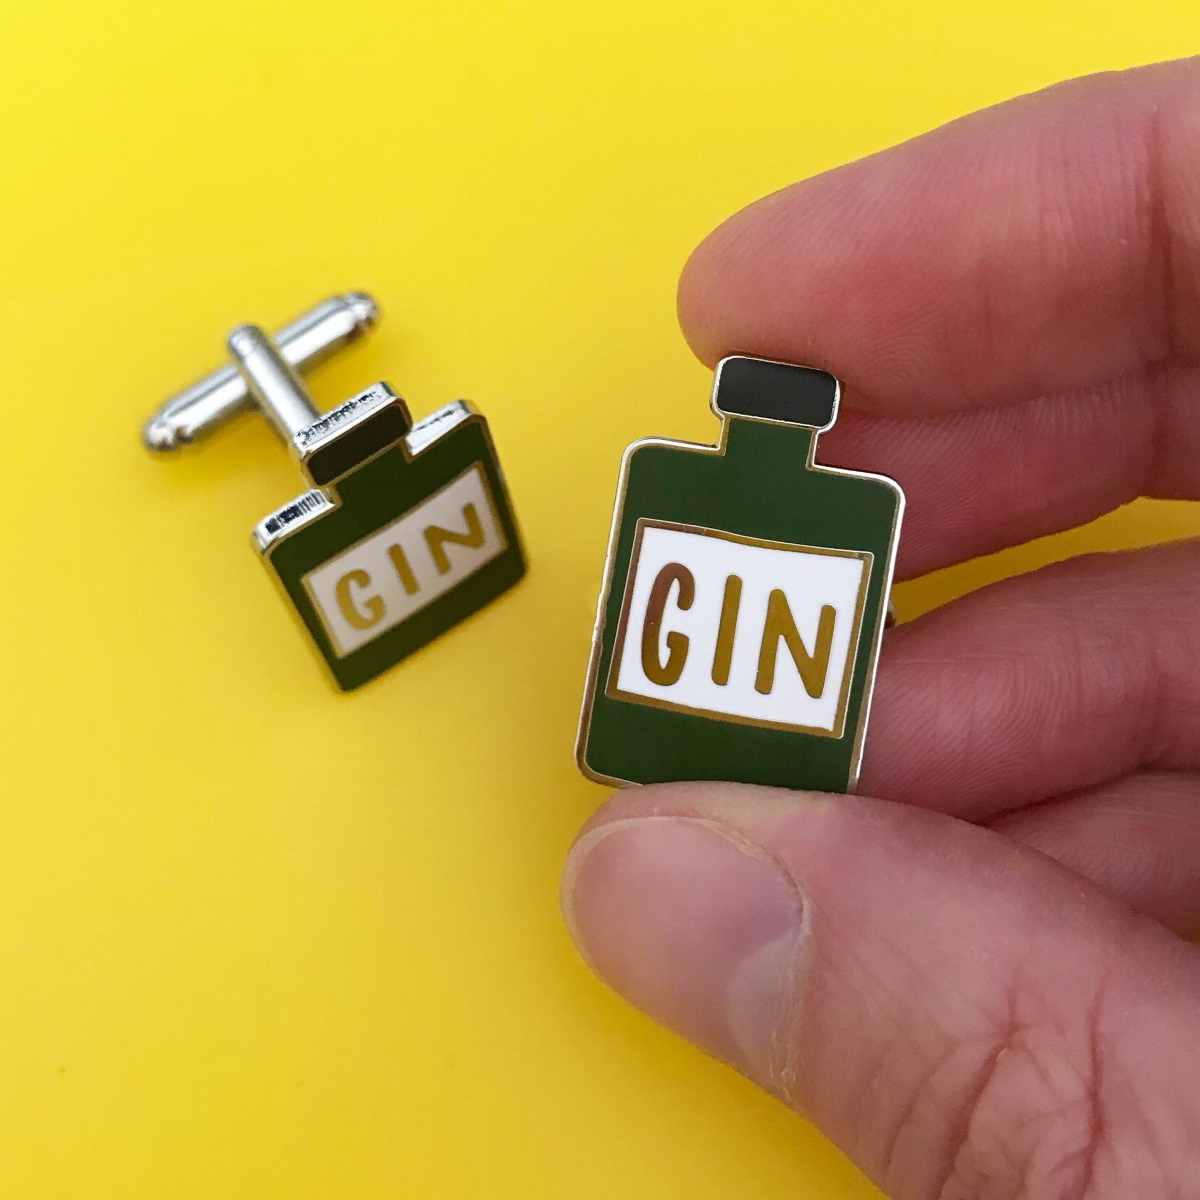 Gin cufflinks